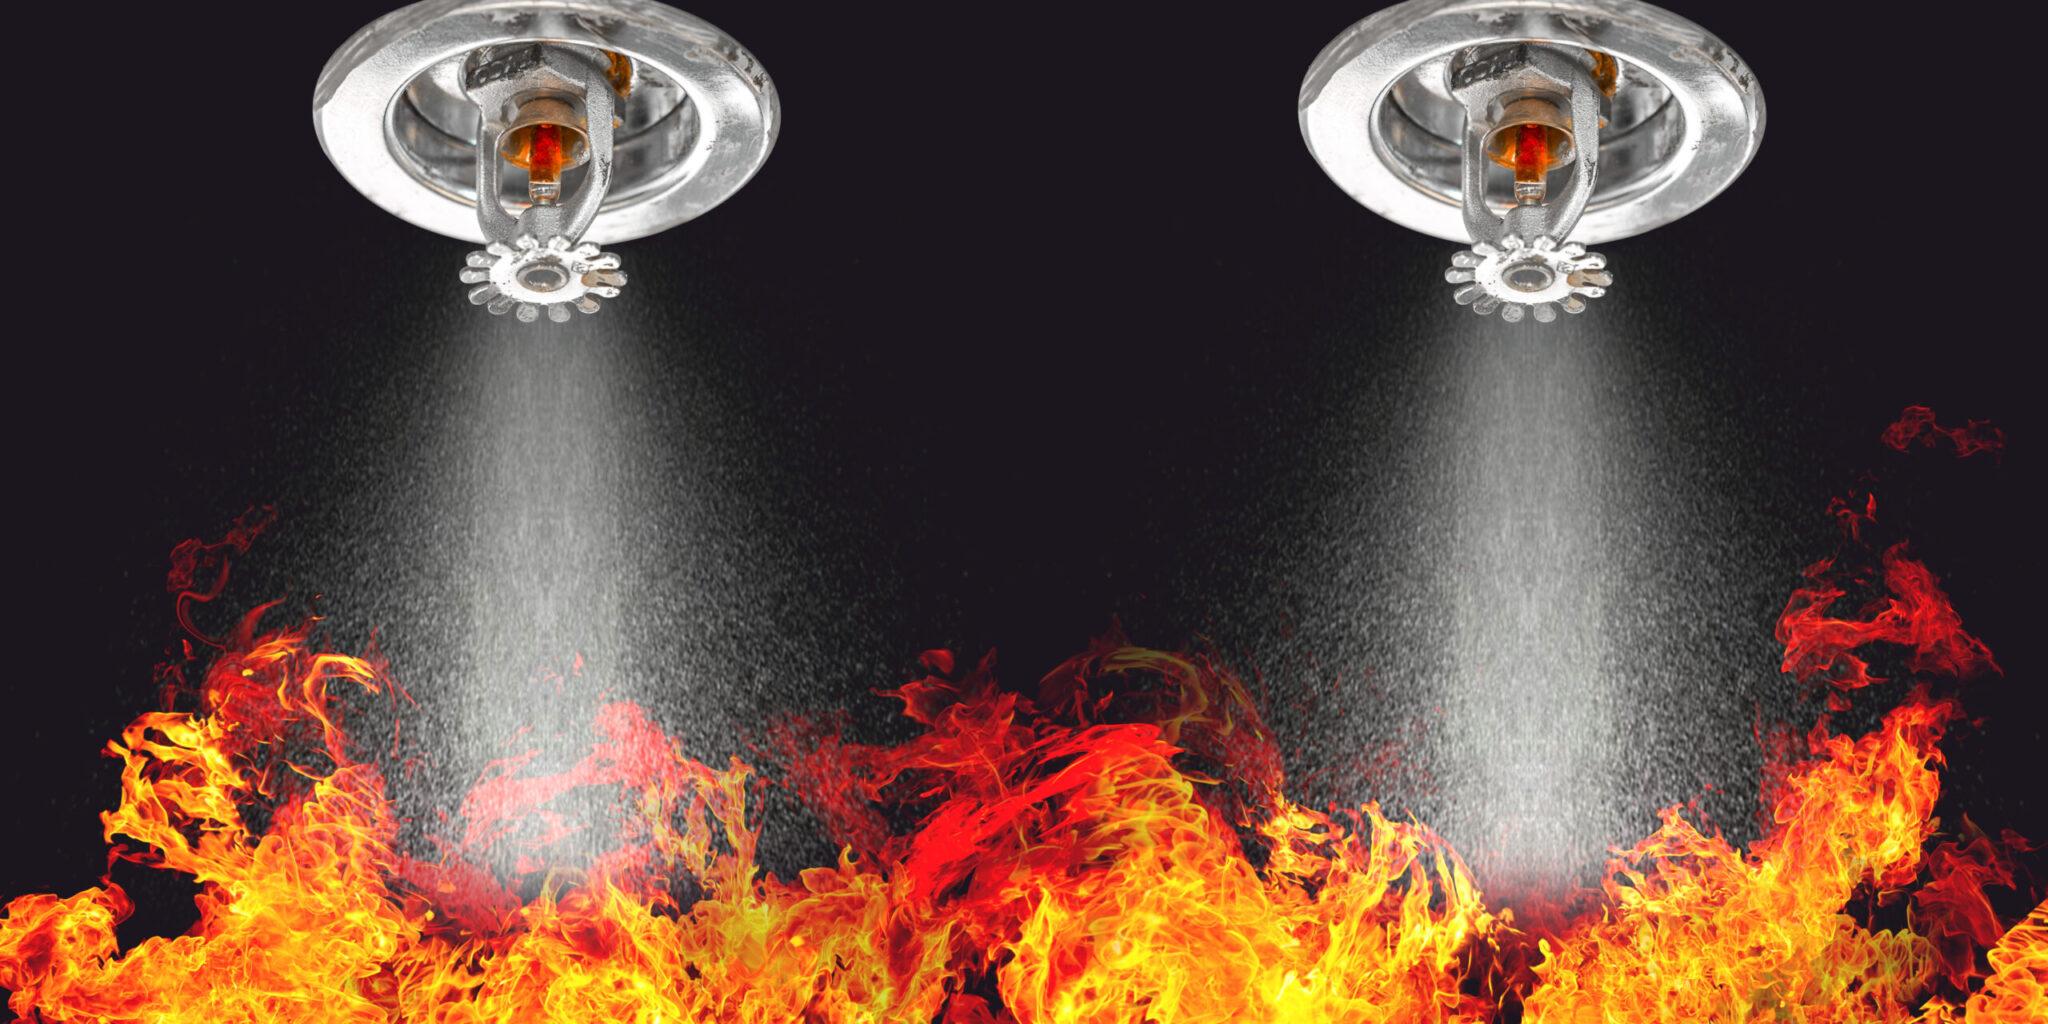 Fire Sprinklers Spraying